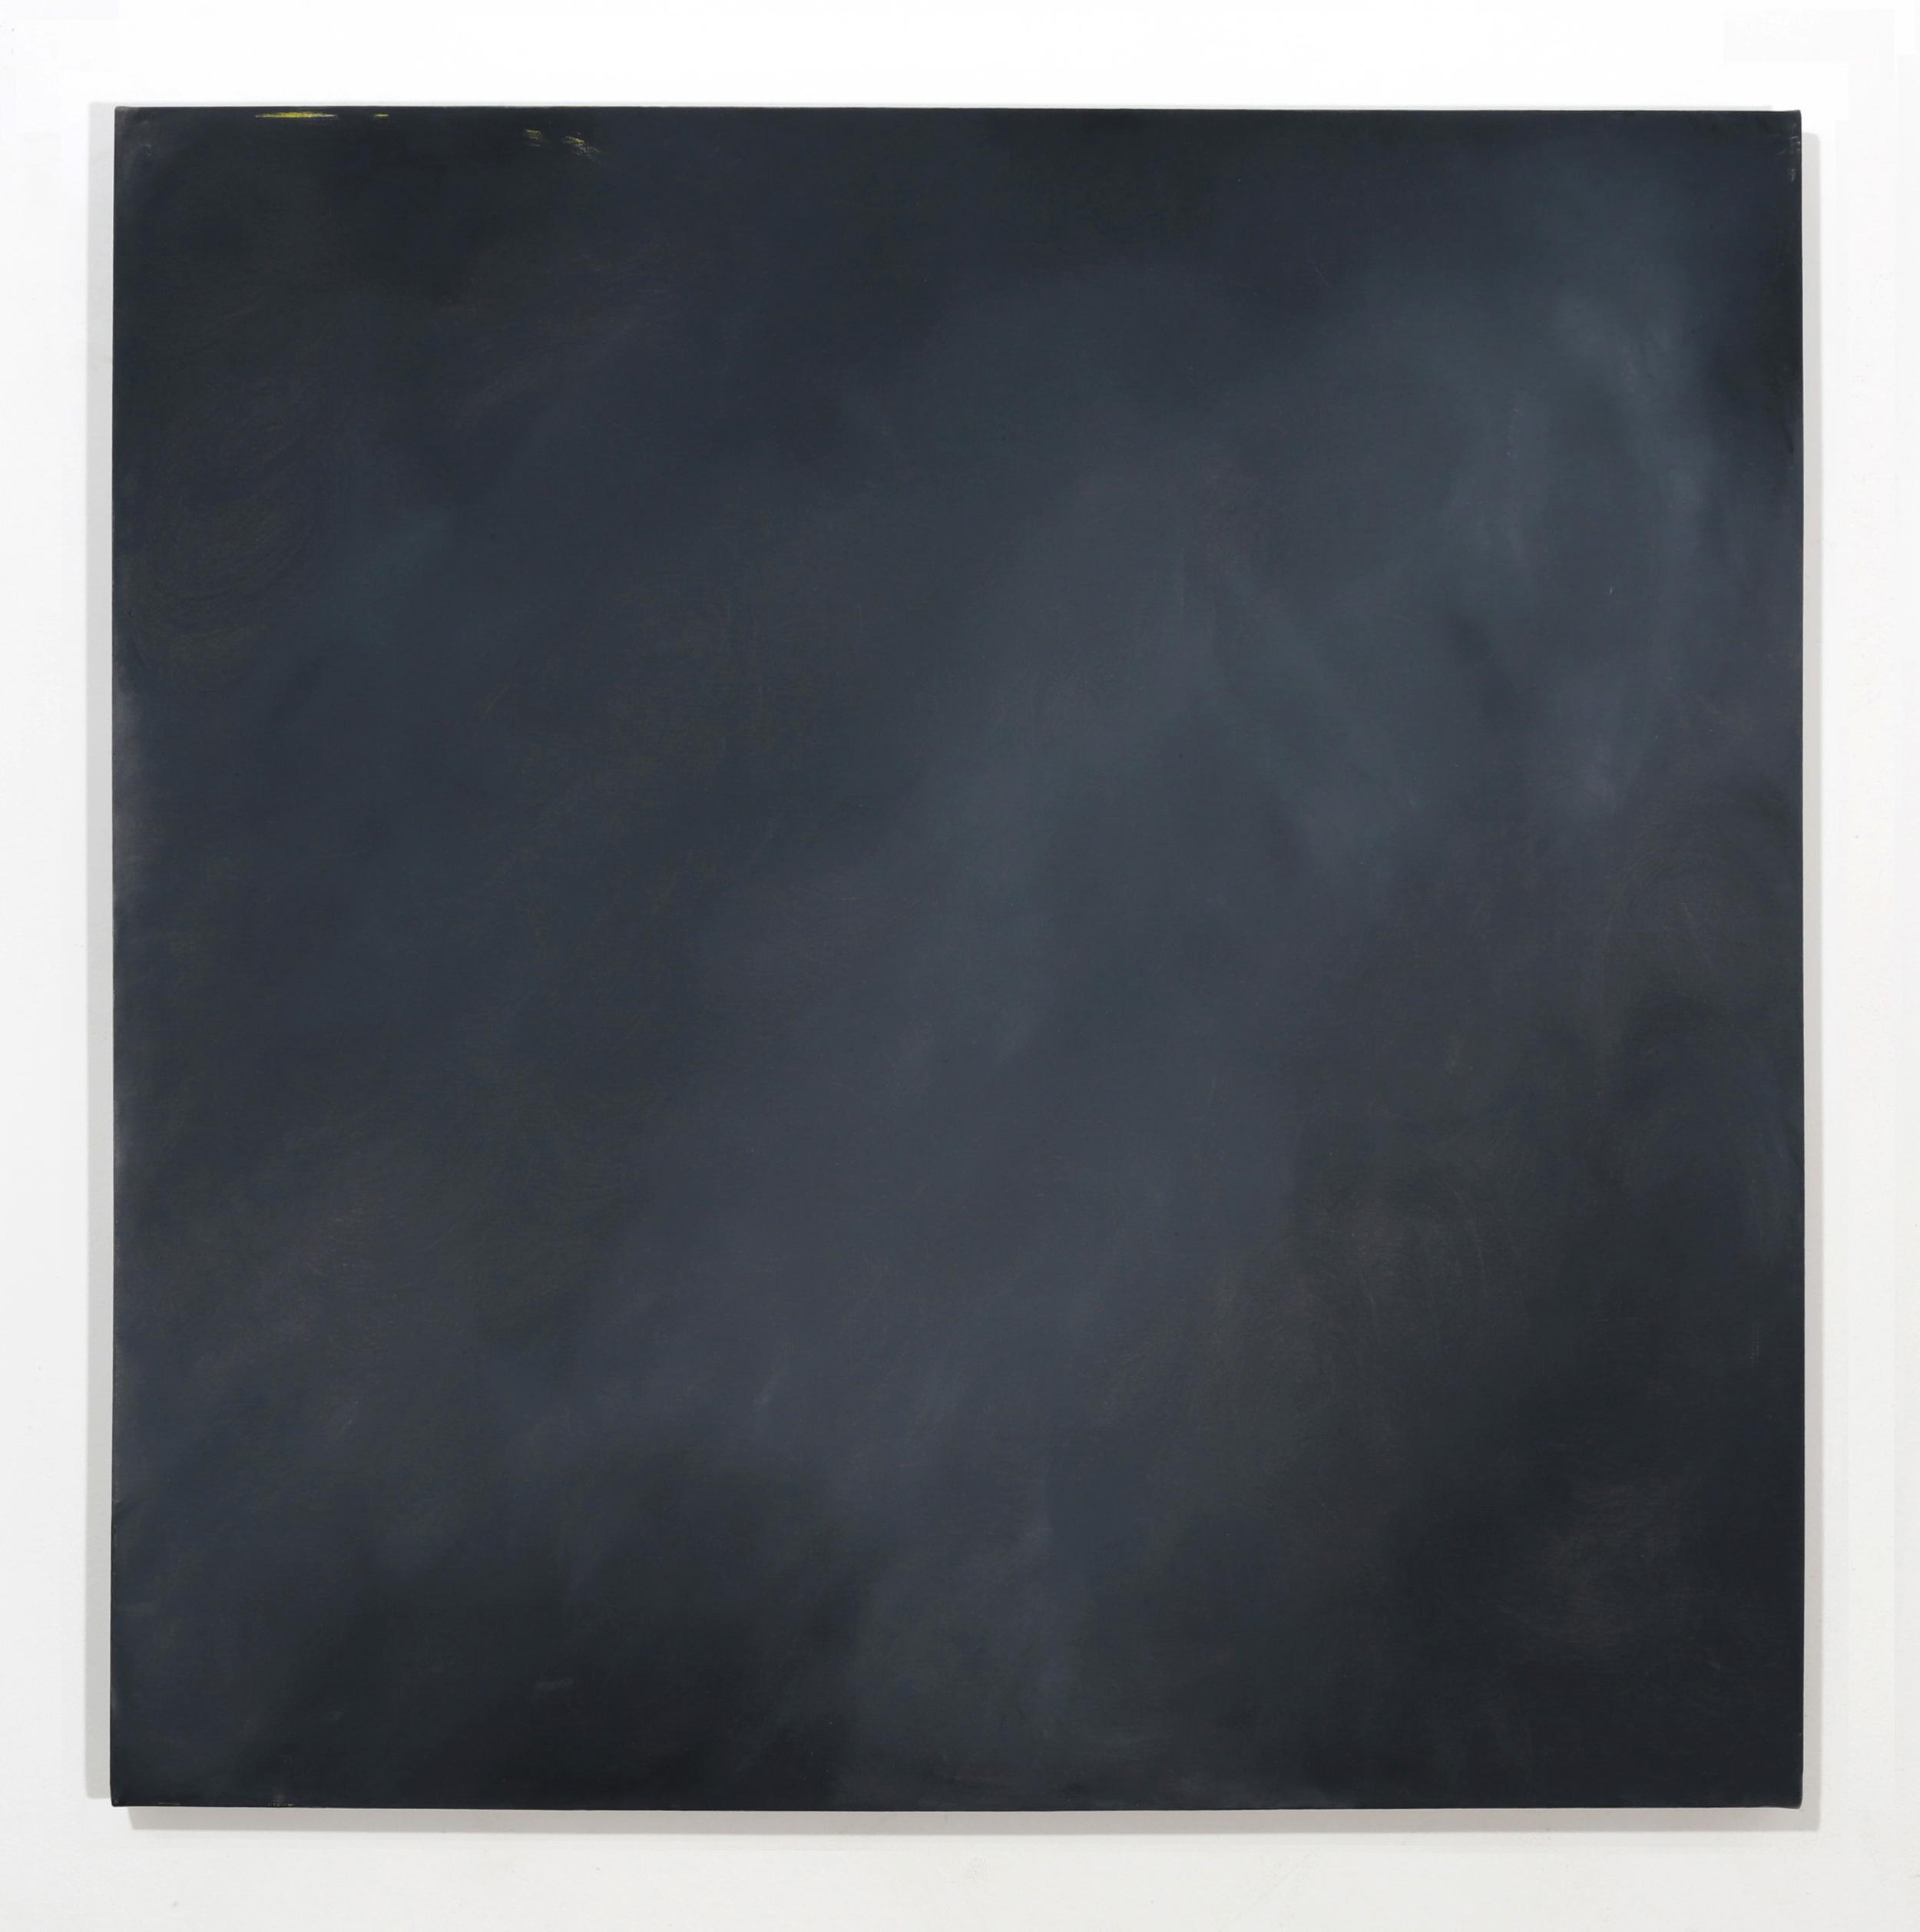 Untitled (Black), 2013